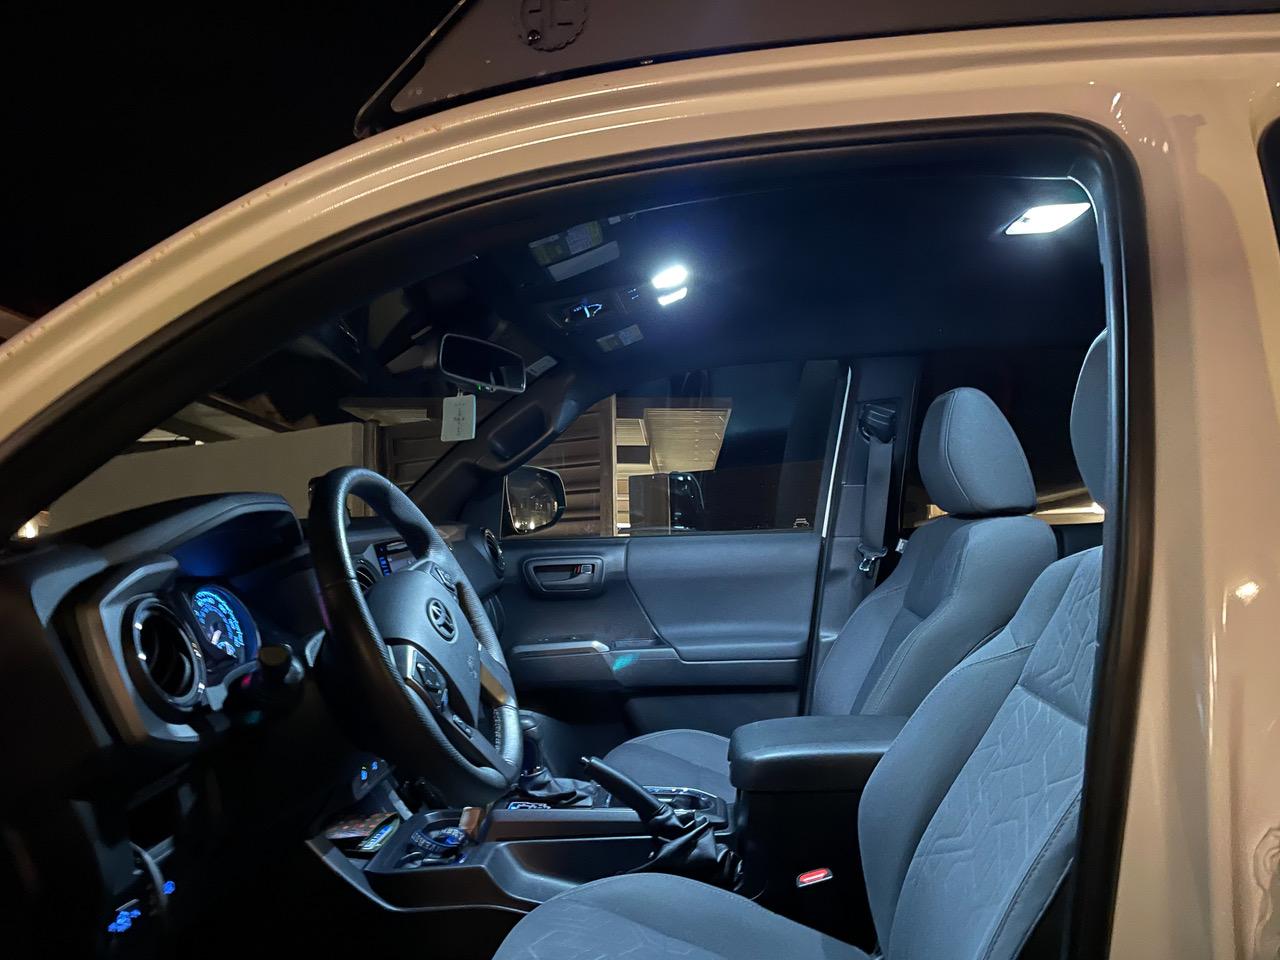 Night Shots for VLEDS Interior LED Light Kit for 3rd Gen Tacoma